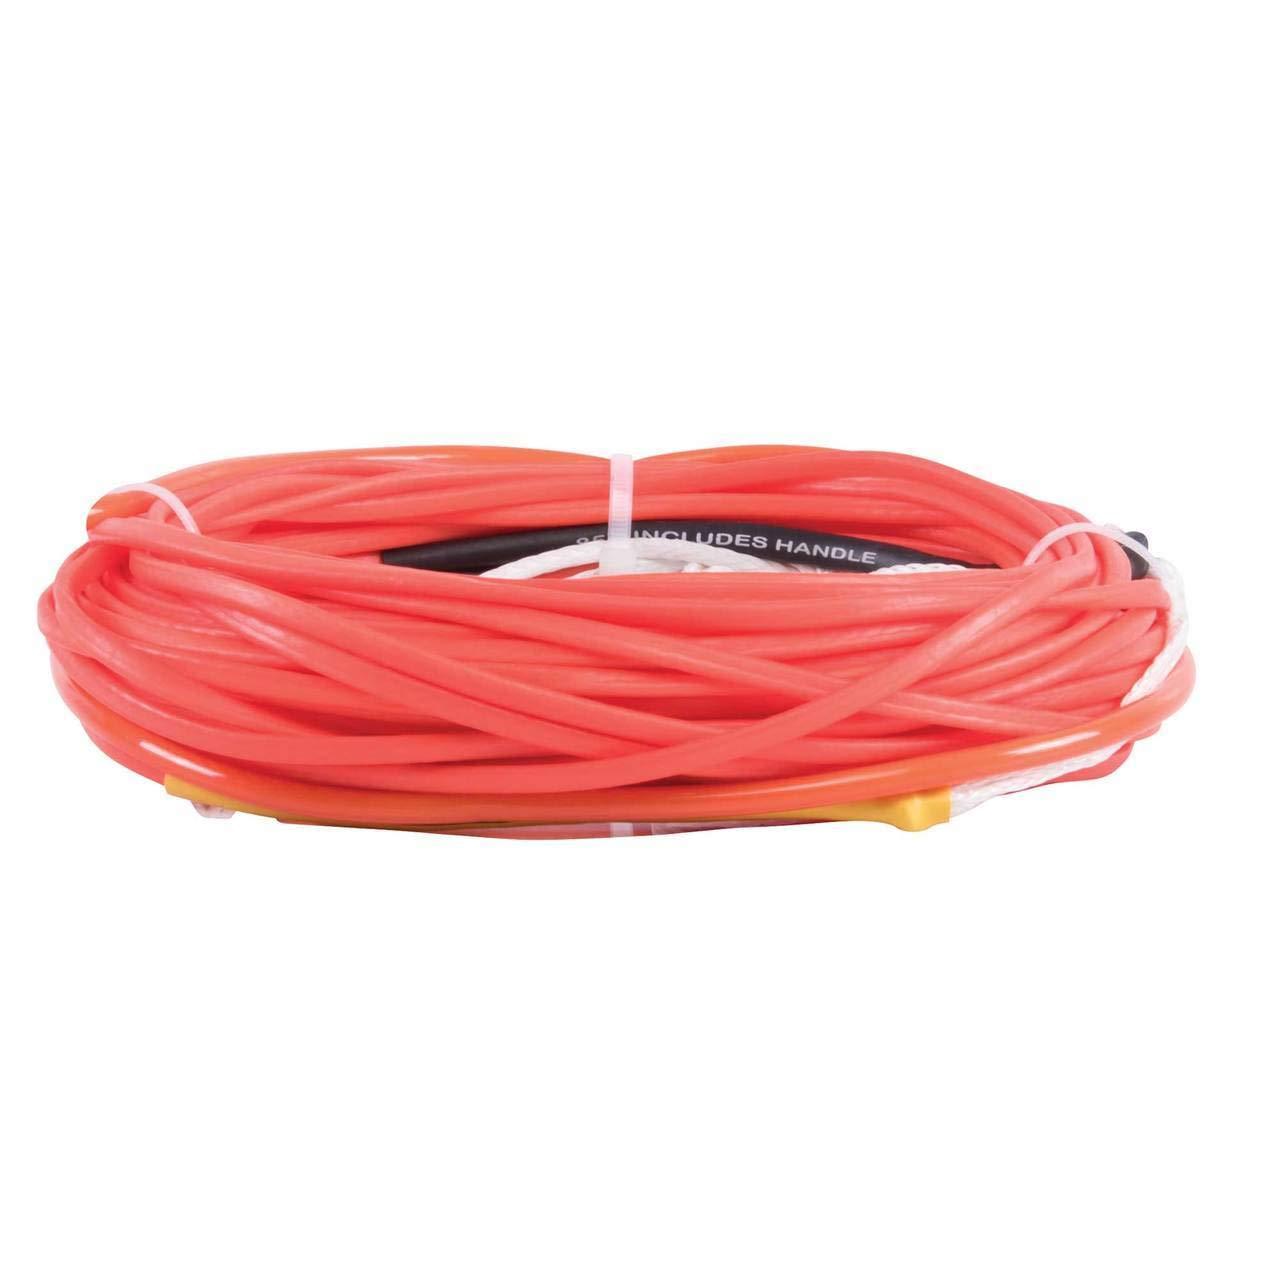 Hyperlite Webb Pro Package with Flat Line Rope Handle for Waterski Boat